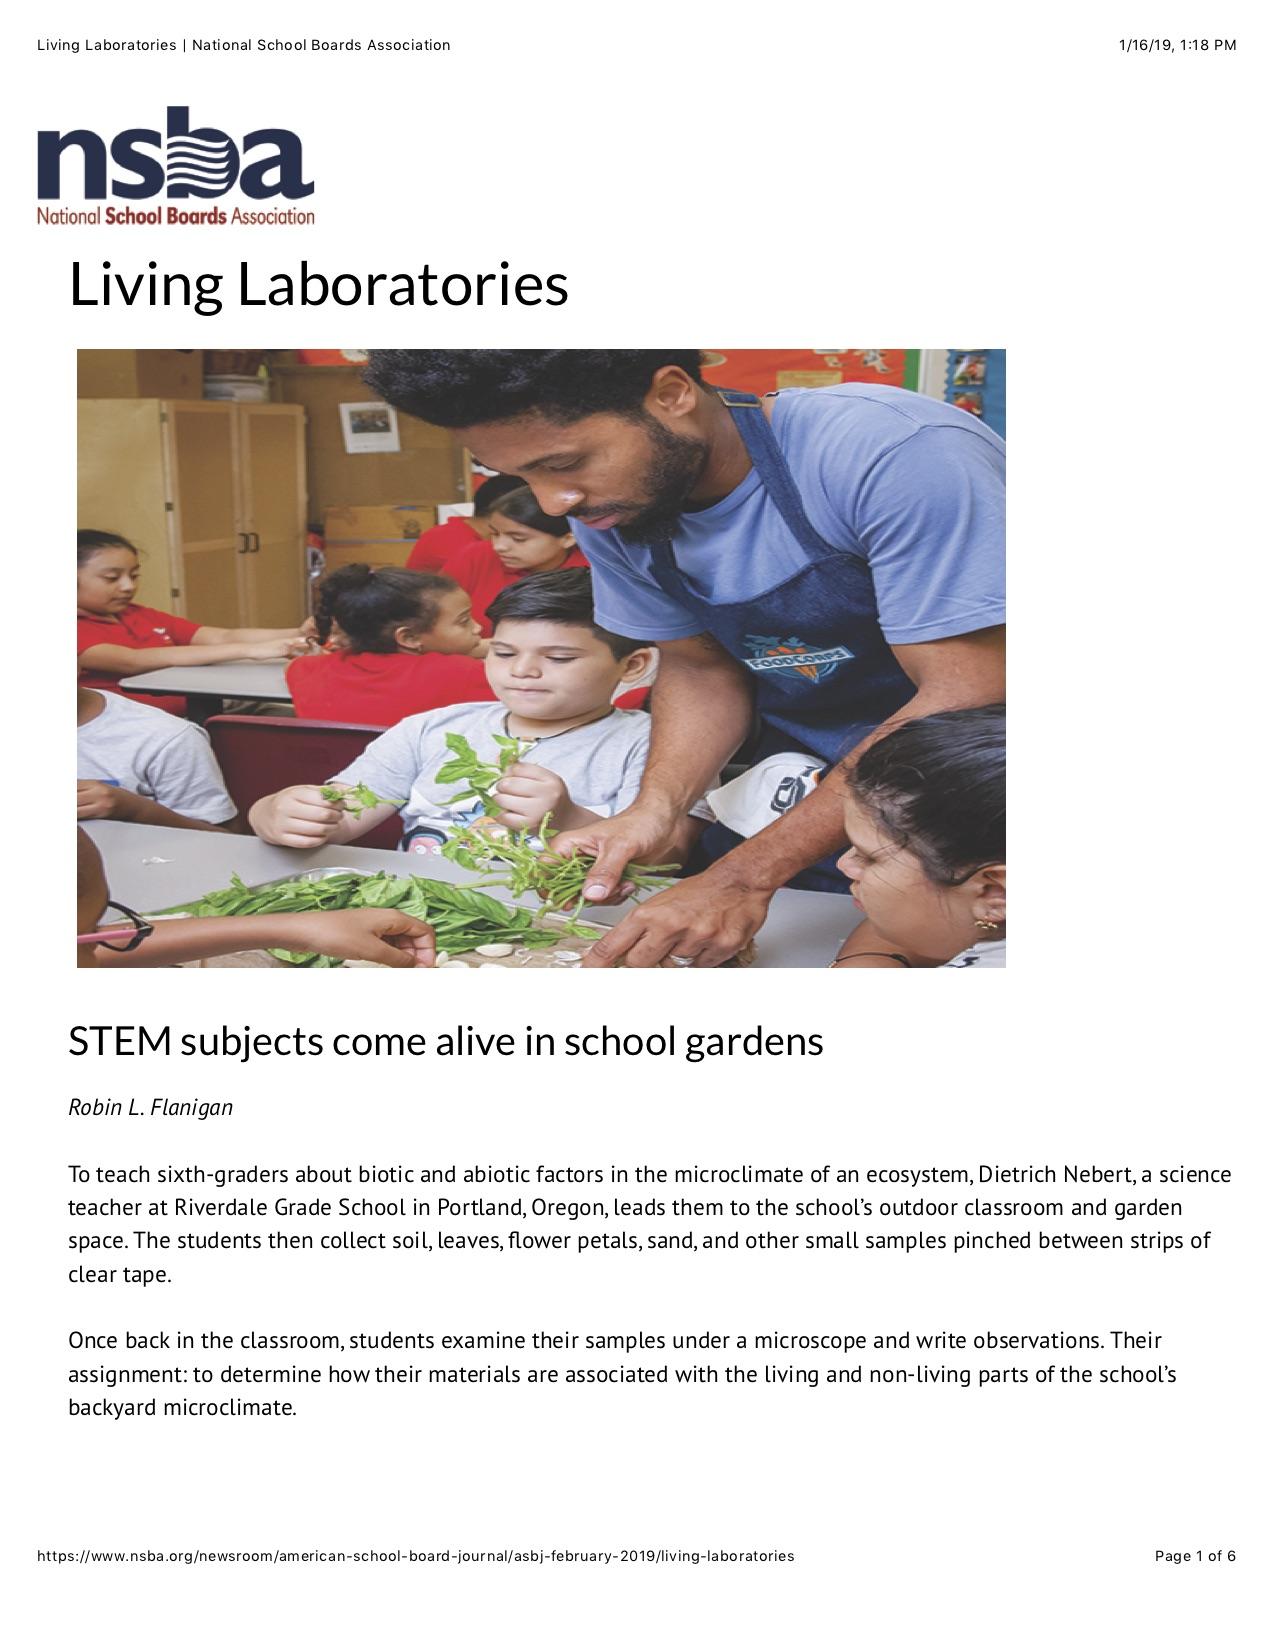 Living Laboratories | National School Boards Association.jpg